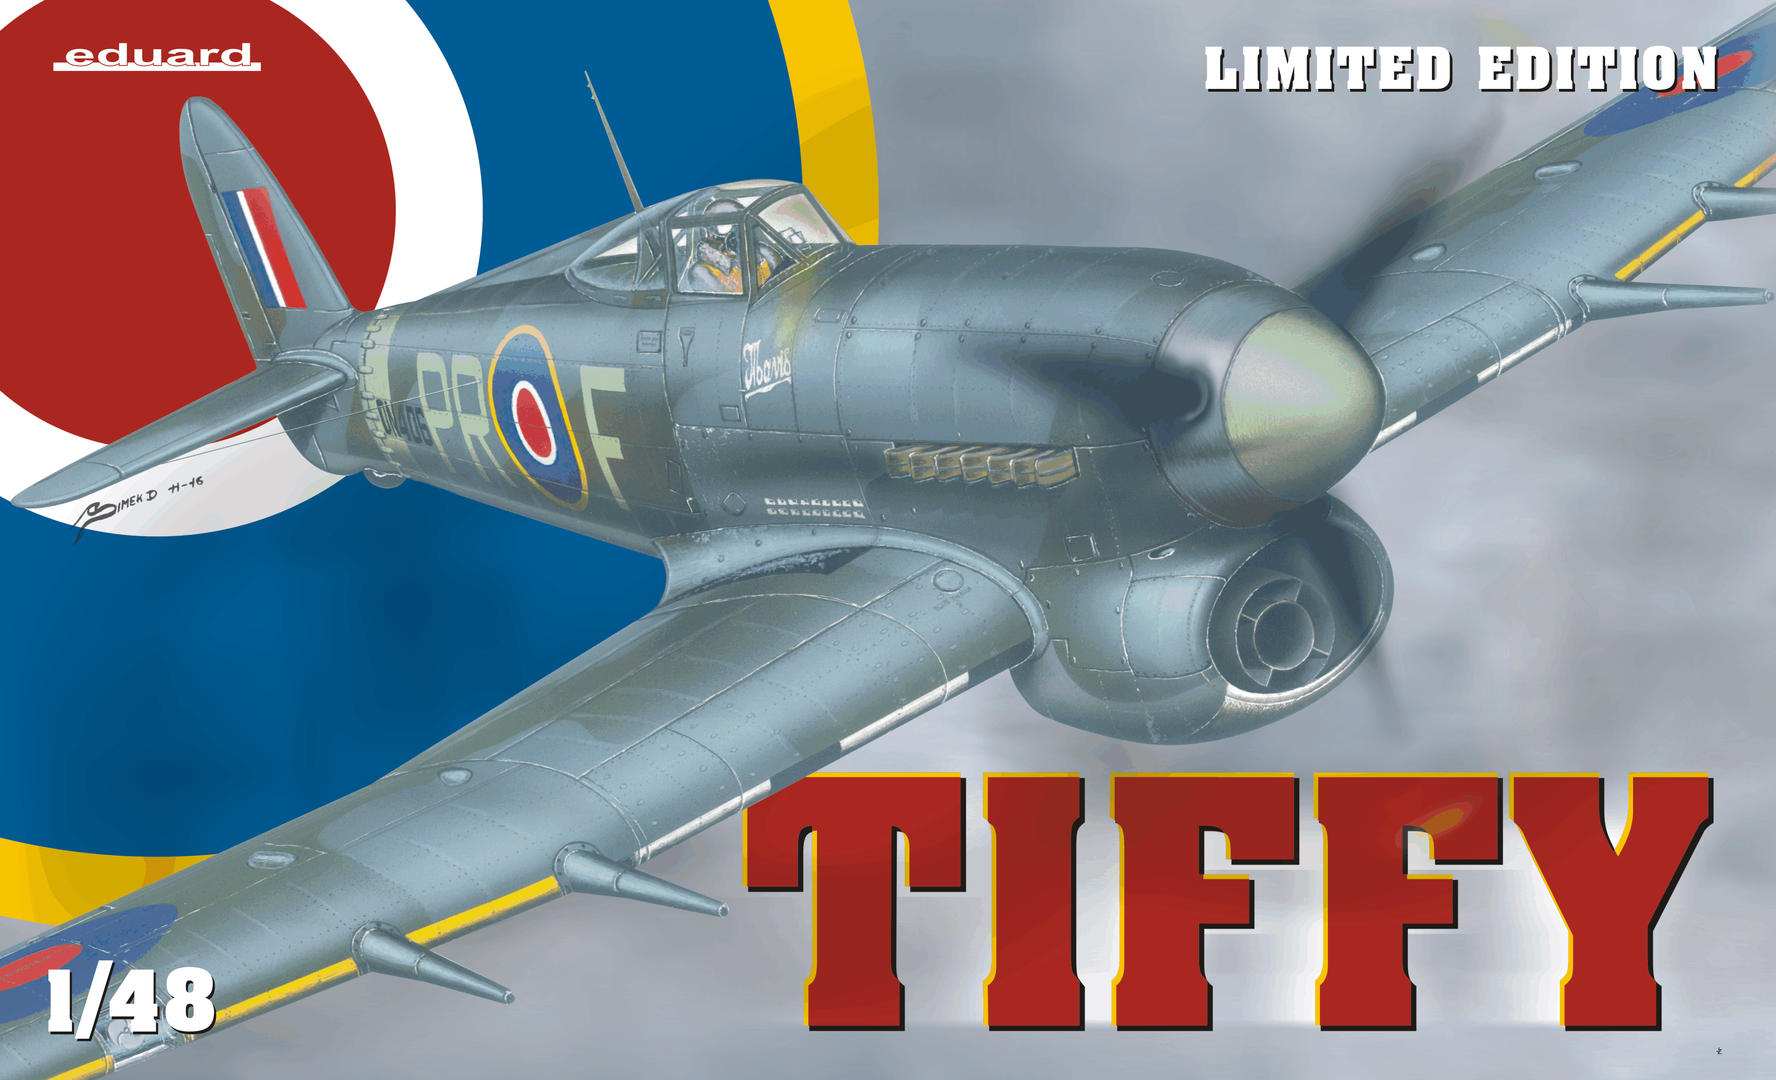 Eduard-1131-Hawker-Typhoon-Mk.-Ib-Deckelbild TIFFY - Typhoon Mk. Ib von Eduard im Maßstab 1:48 ( # 1131 )